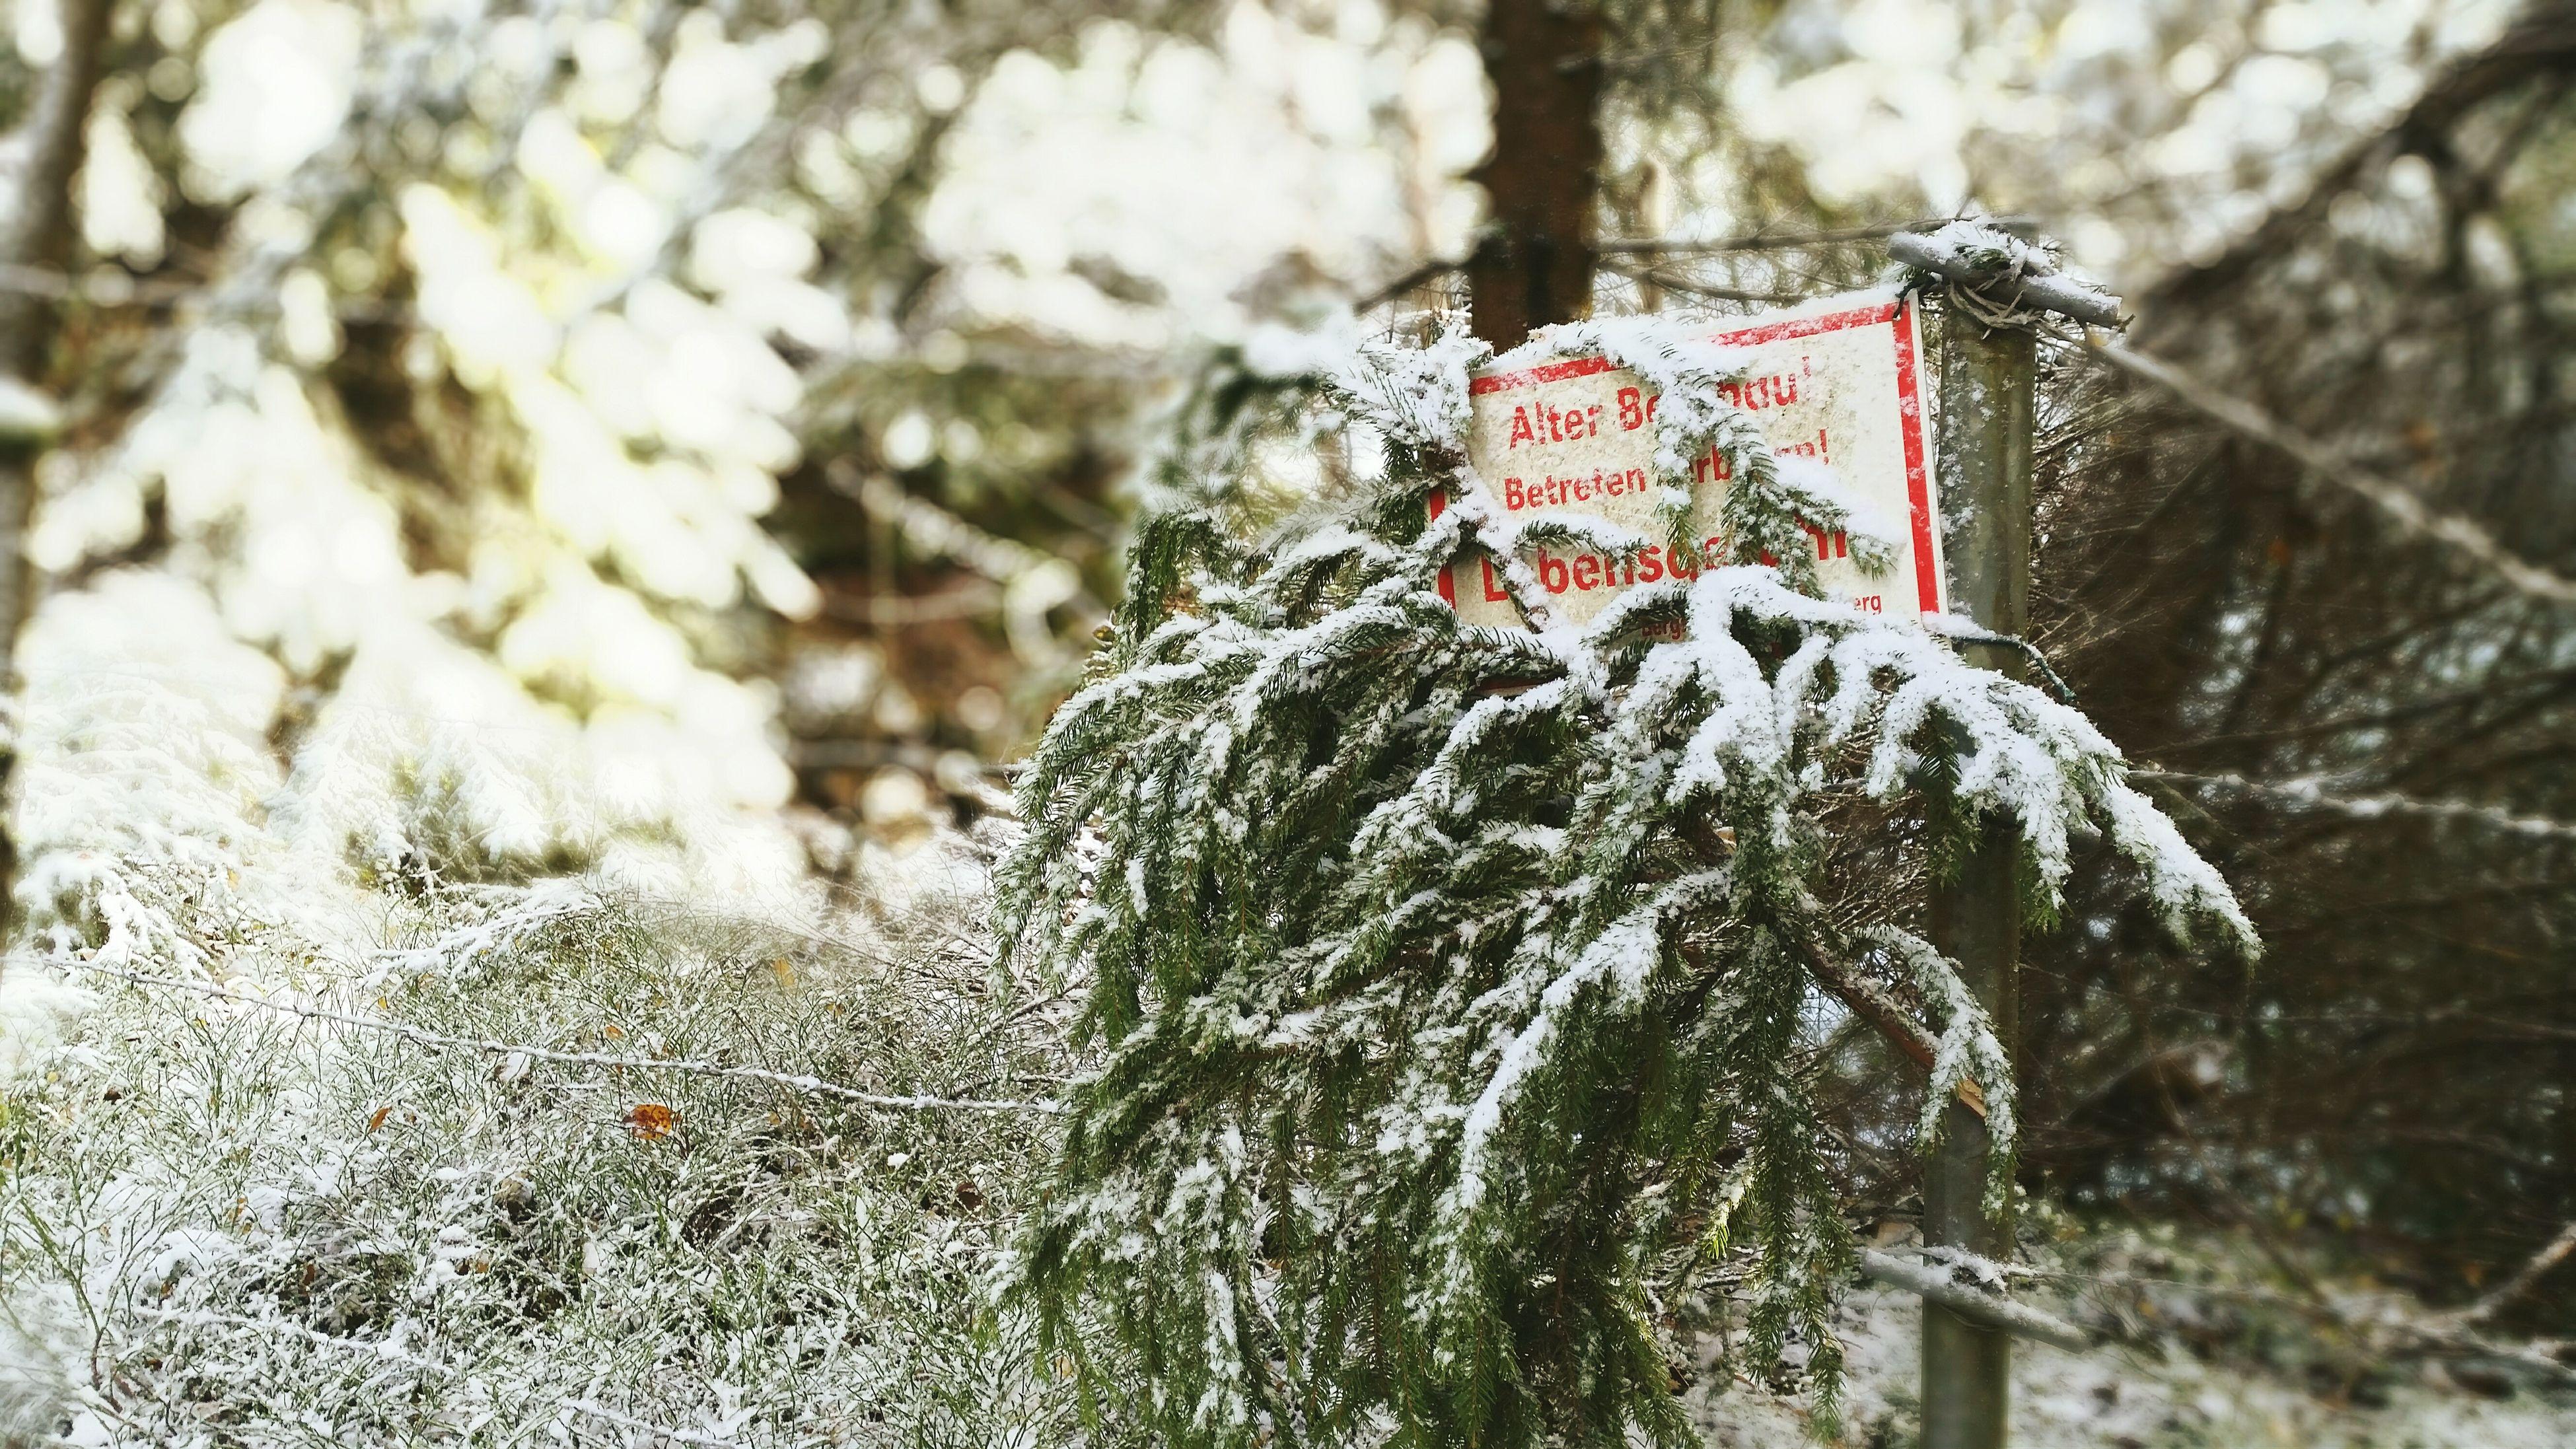 Wald Smartphonephotography Smartphone Photos Herbst🍁 Snow ❄ Beauty In Nature Sachsen Forest Bergbau ALTBERGBAU